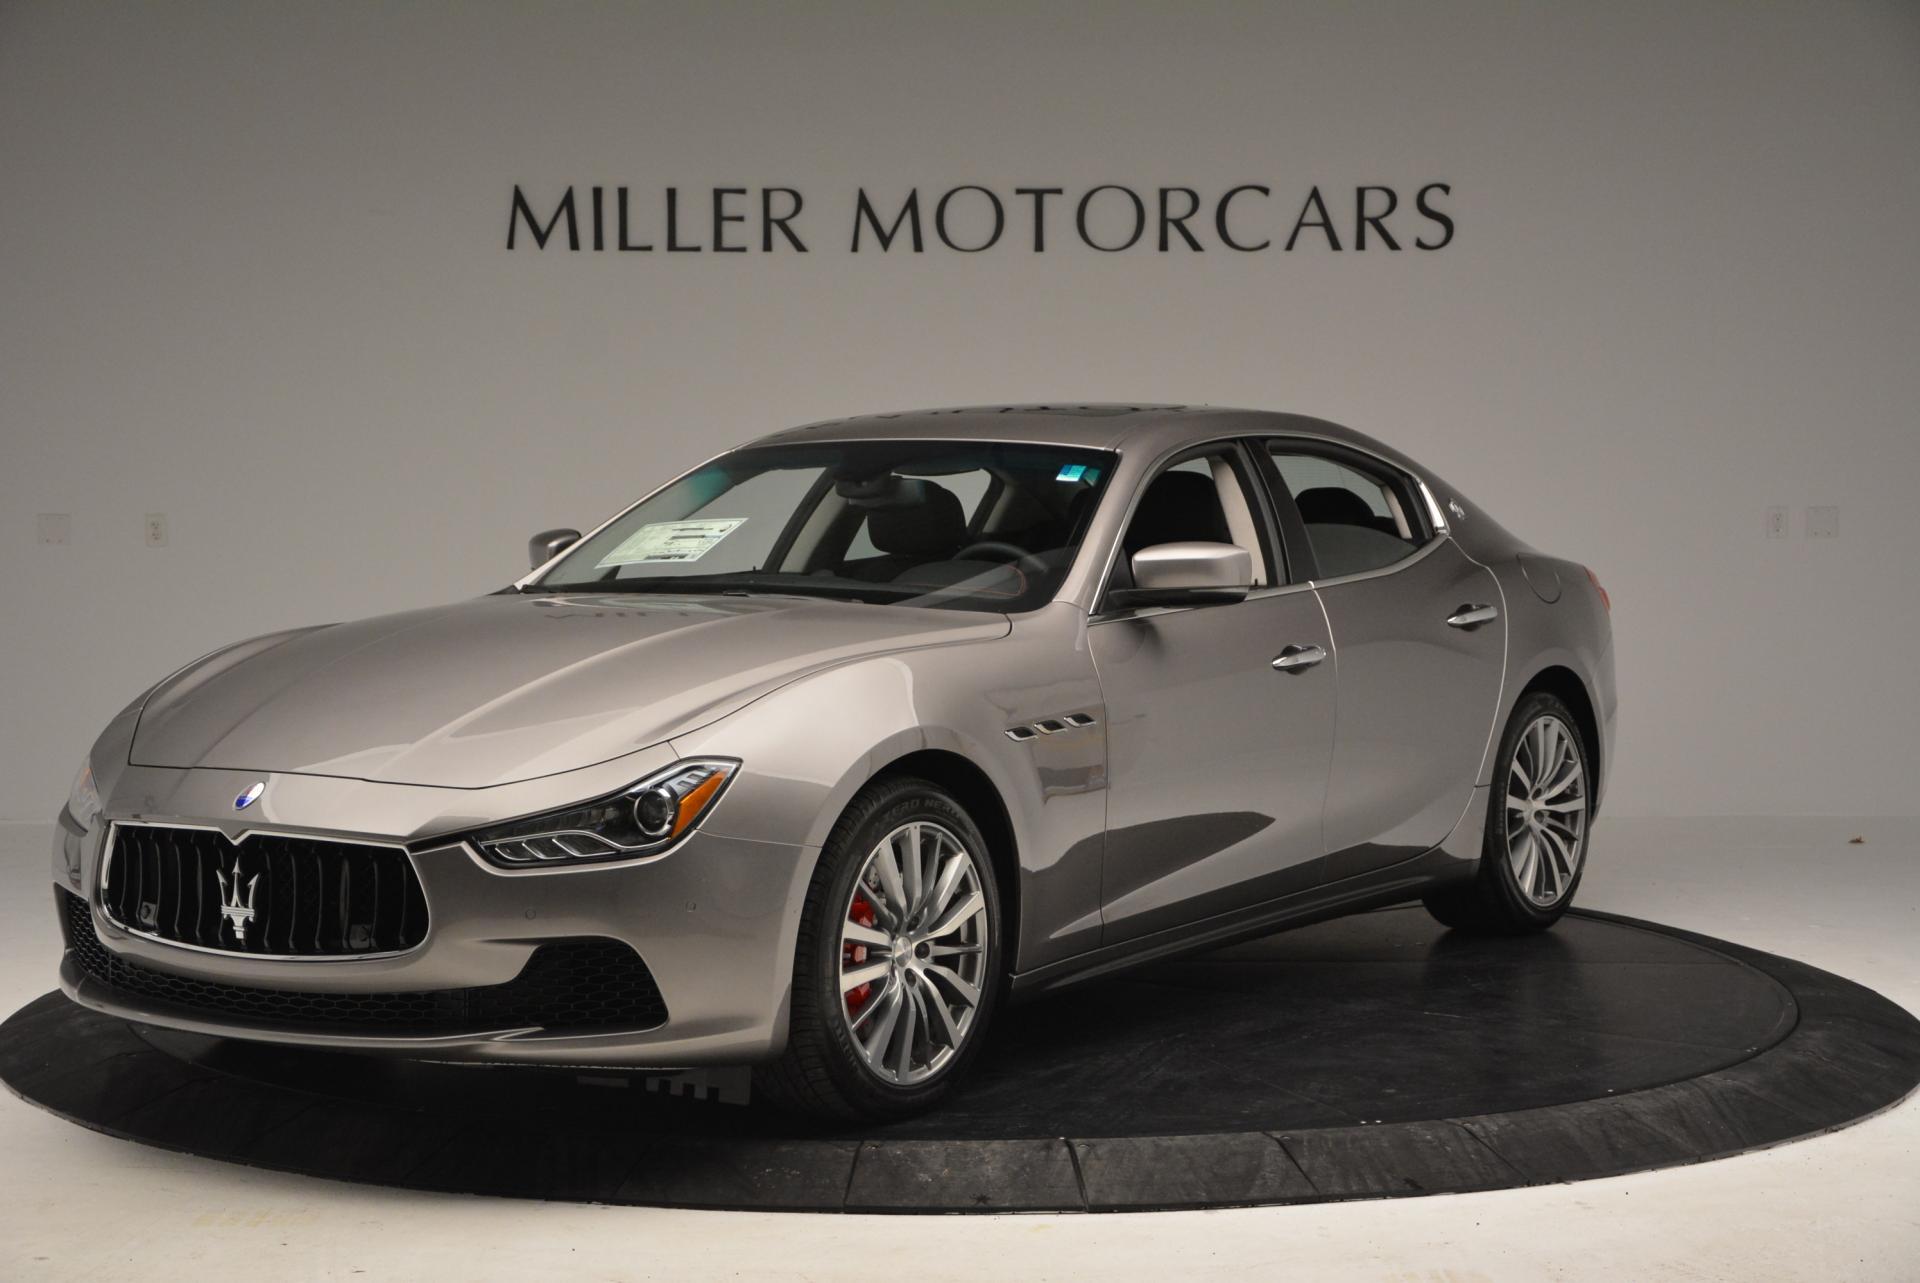 New 2016 Maserati Ghibli S Q4 For Sale In Greenwich, CT 177_main